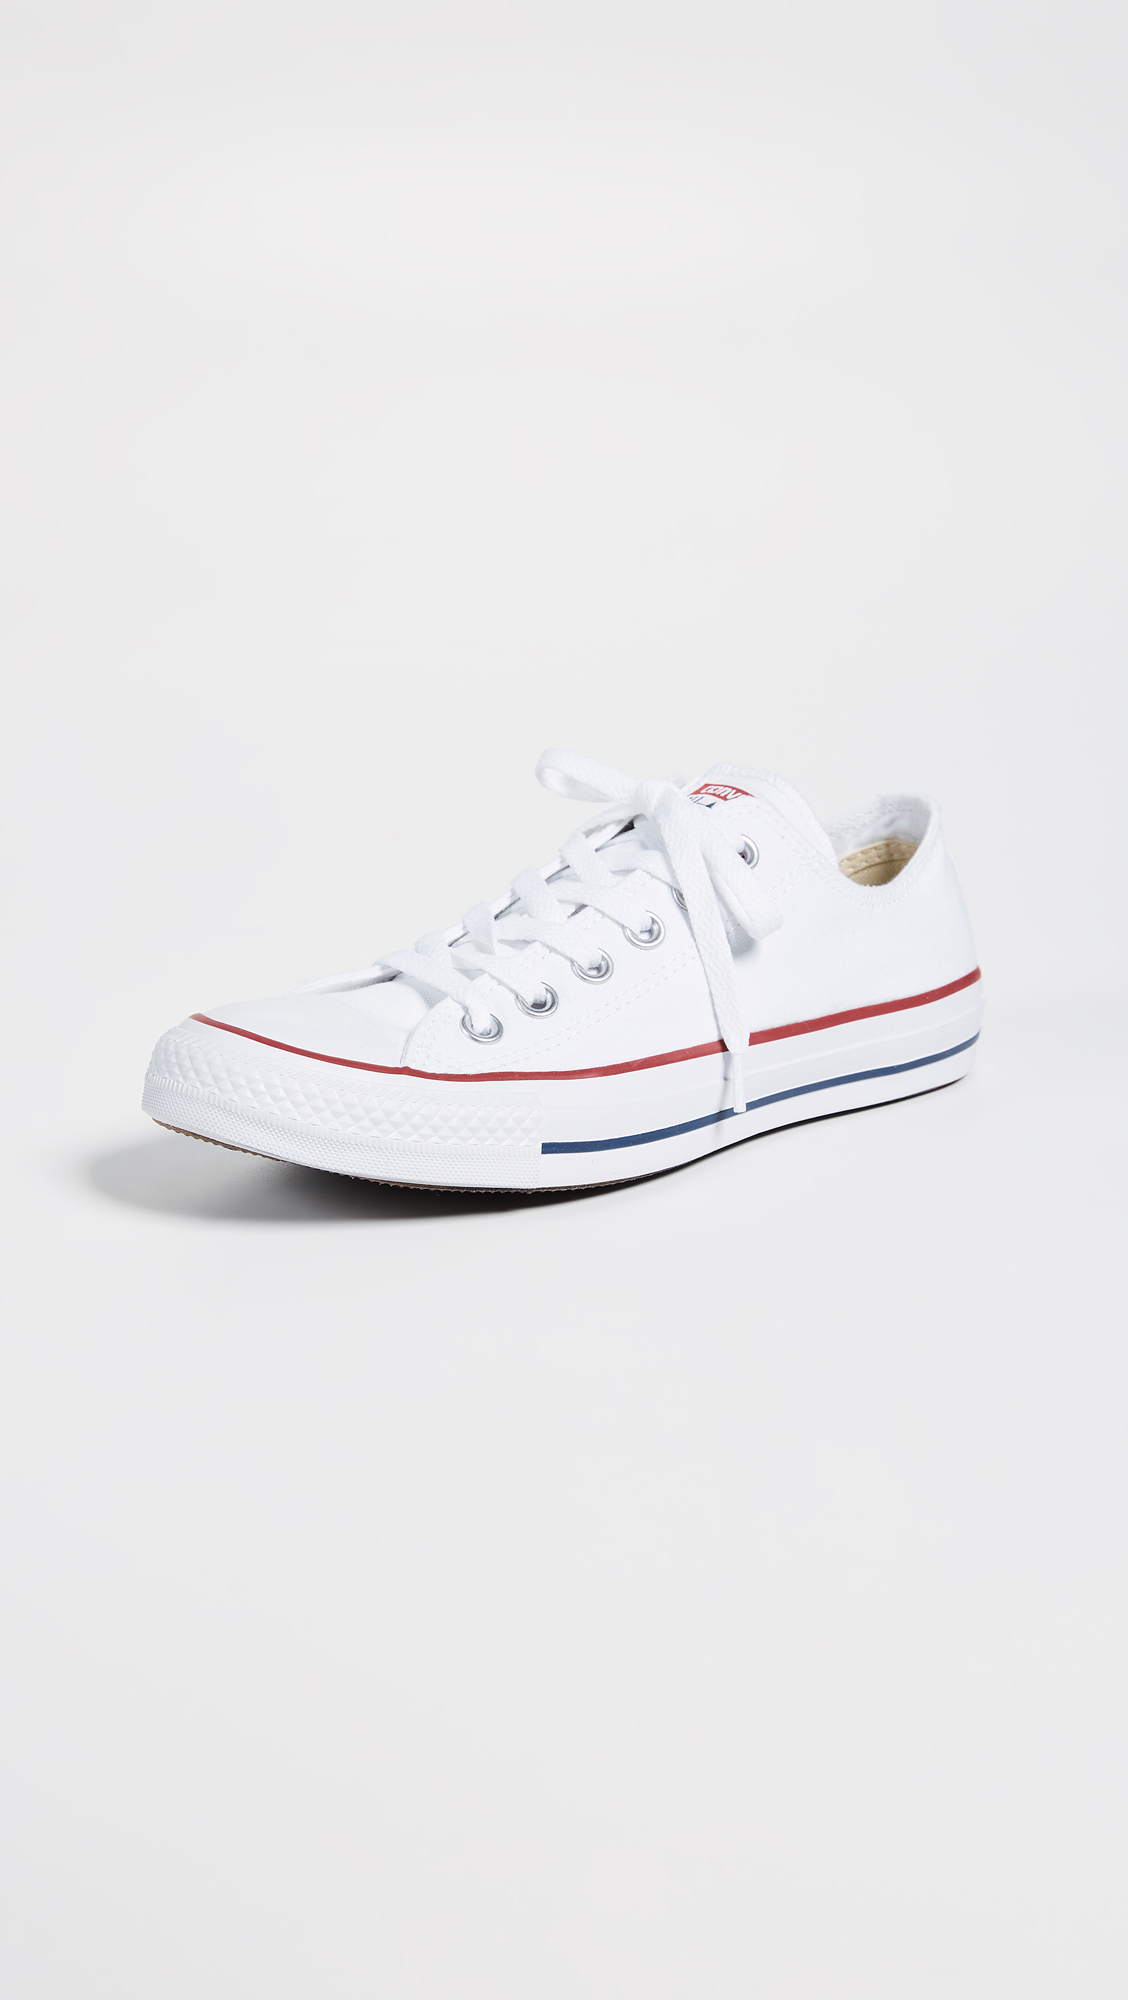 0a07682fb4ea Converse Chuck Taylor All Star Sneakers